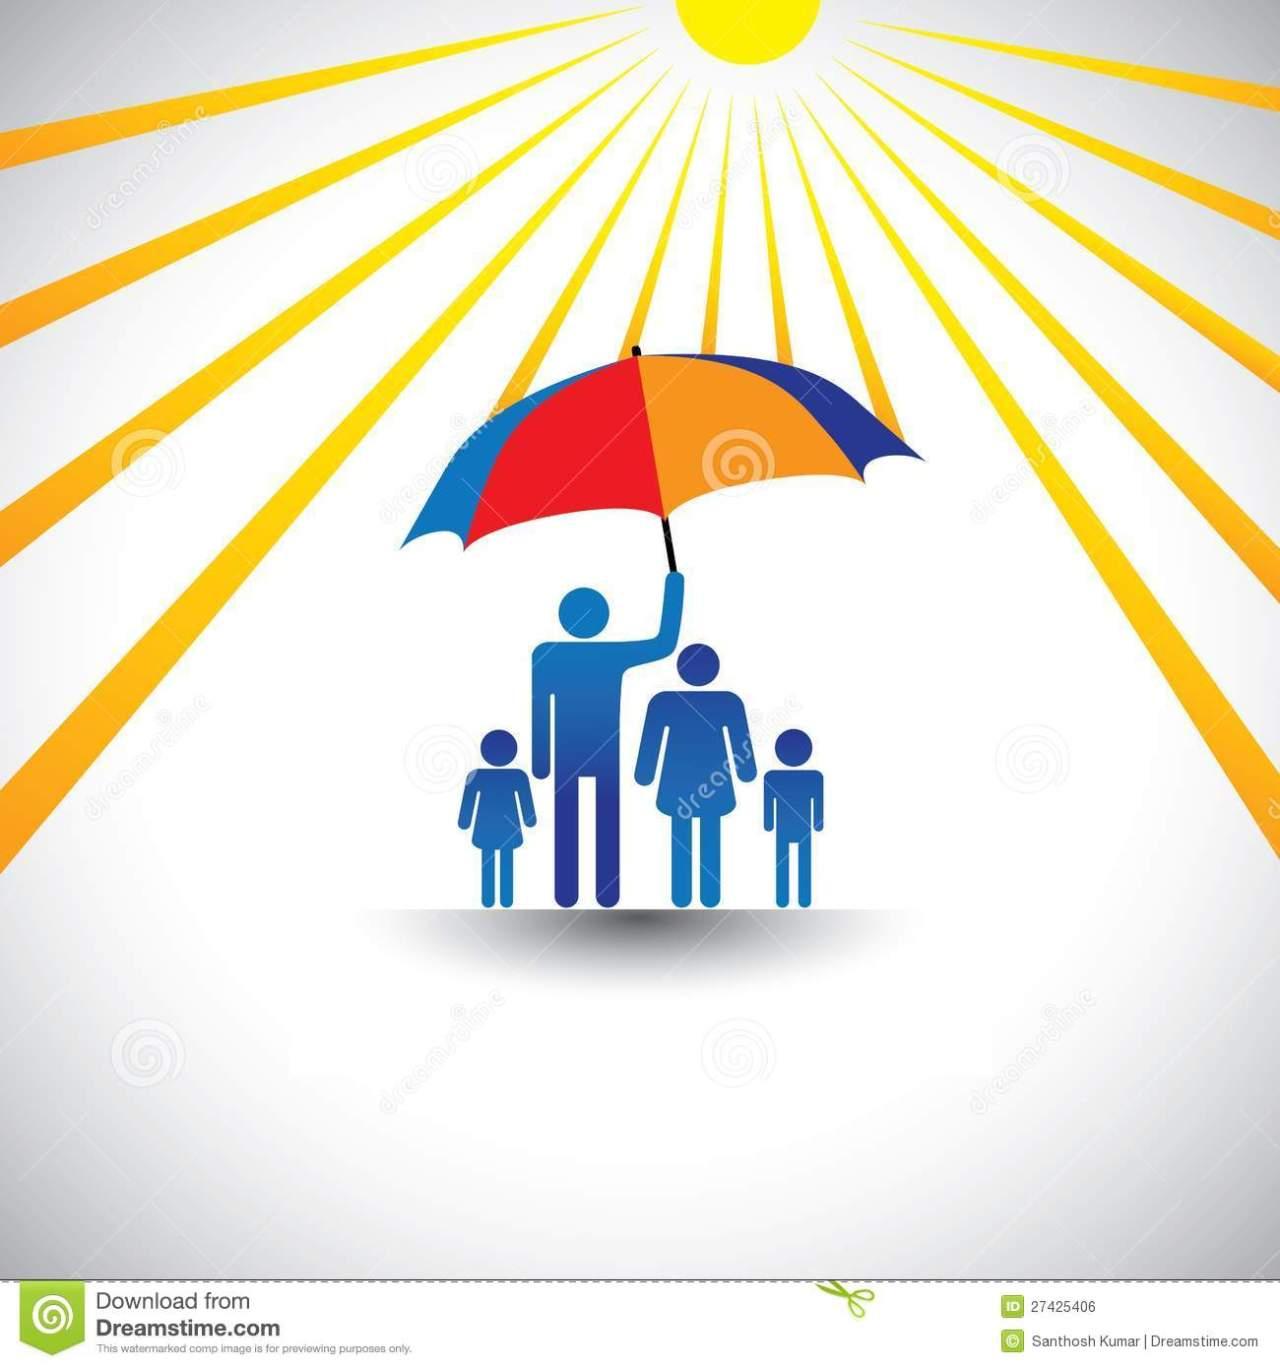 father-protects-family-hot-sun-umbrella-27425406